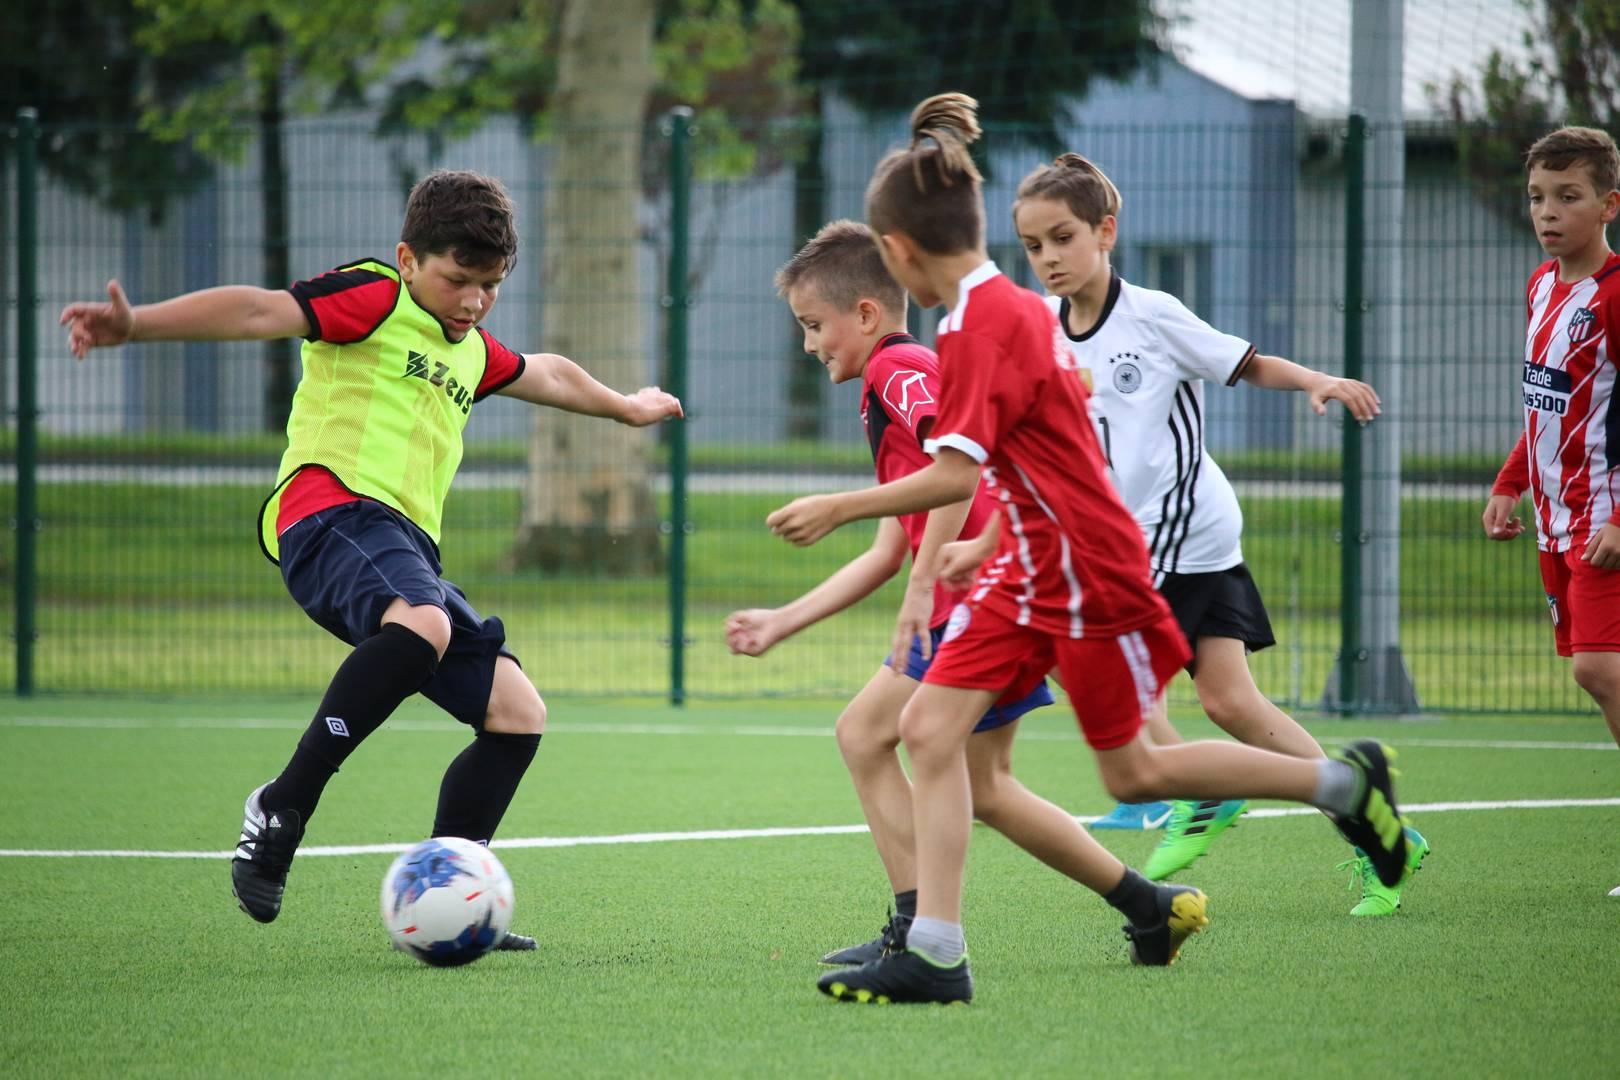 Mlade nogometne nade brusile vještine pod vodstvom trenera Vedriša